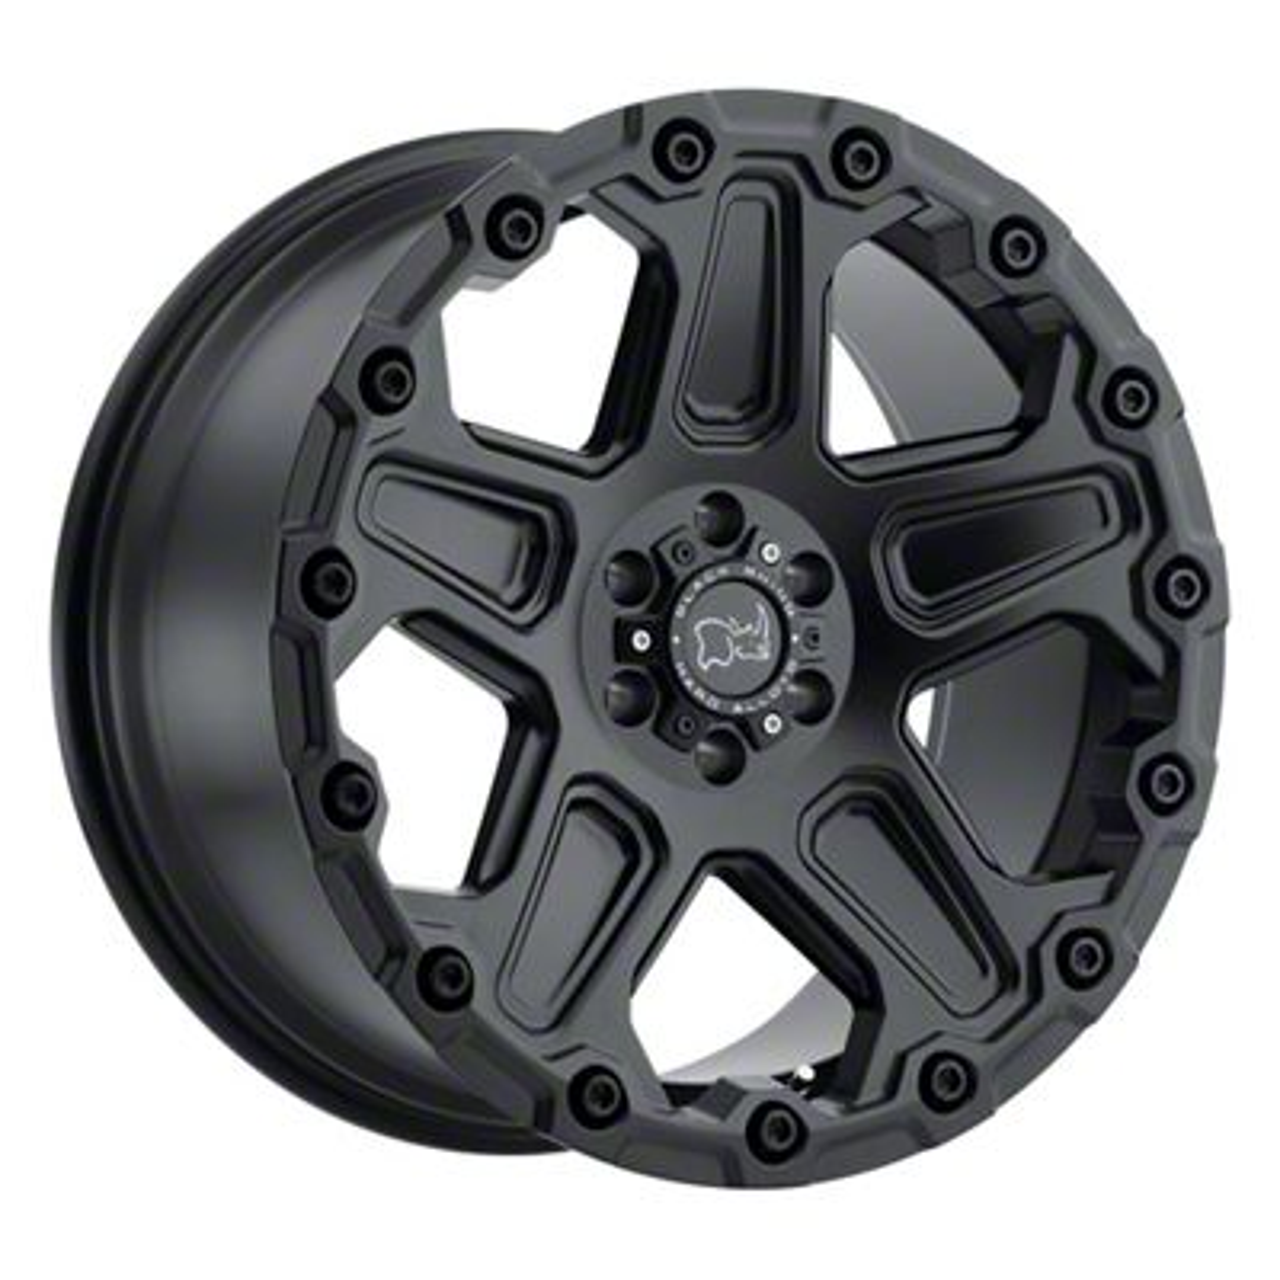 Black Rhino Cog Matte Black Wheel - 18x9.5 (18-19 Jeep Wrangler JL)